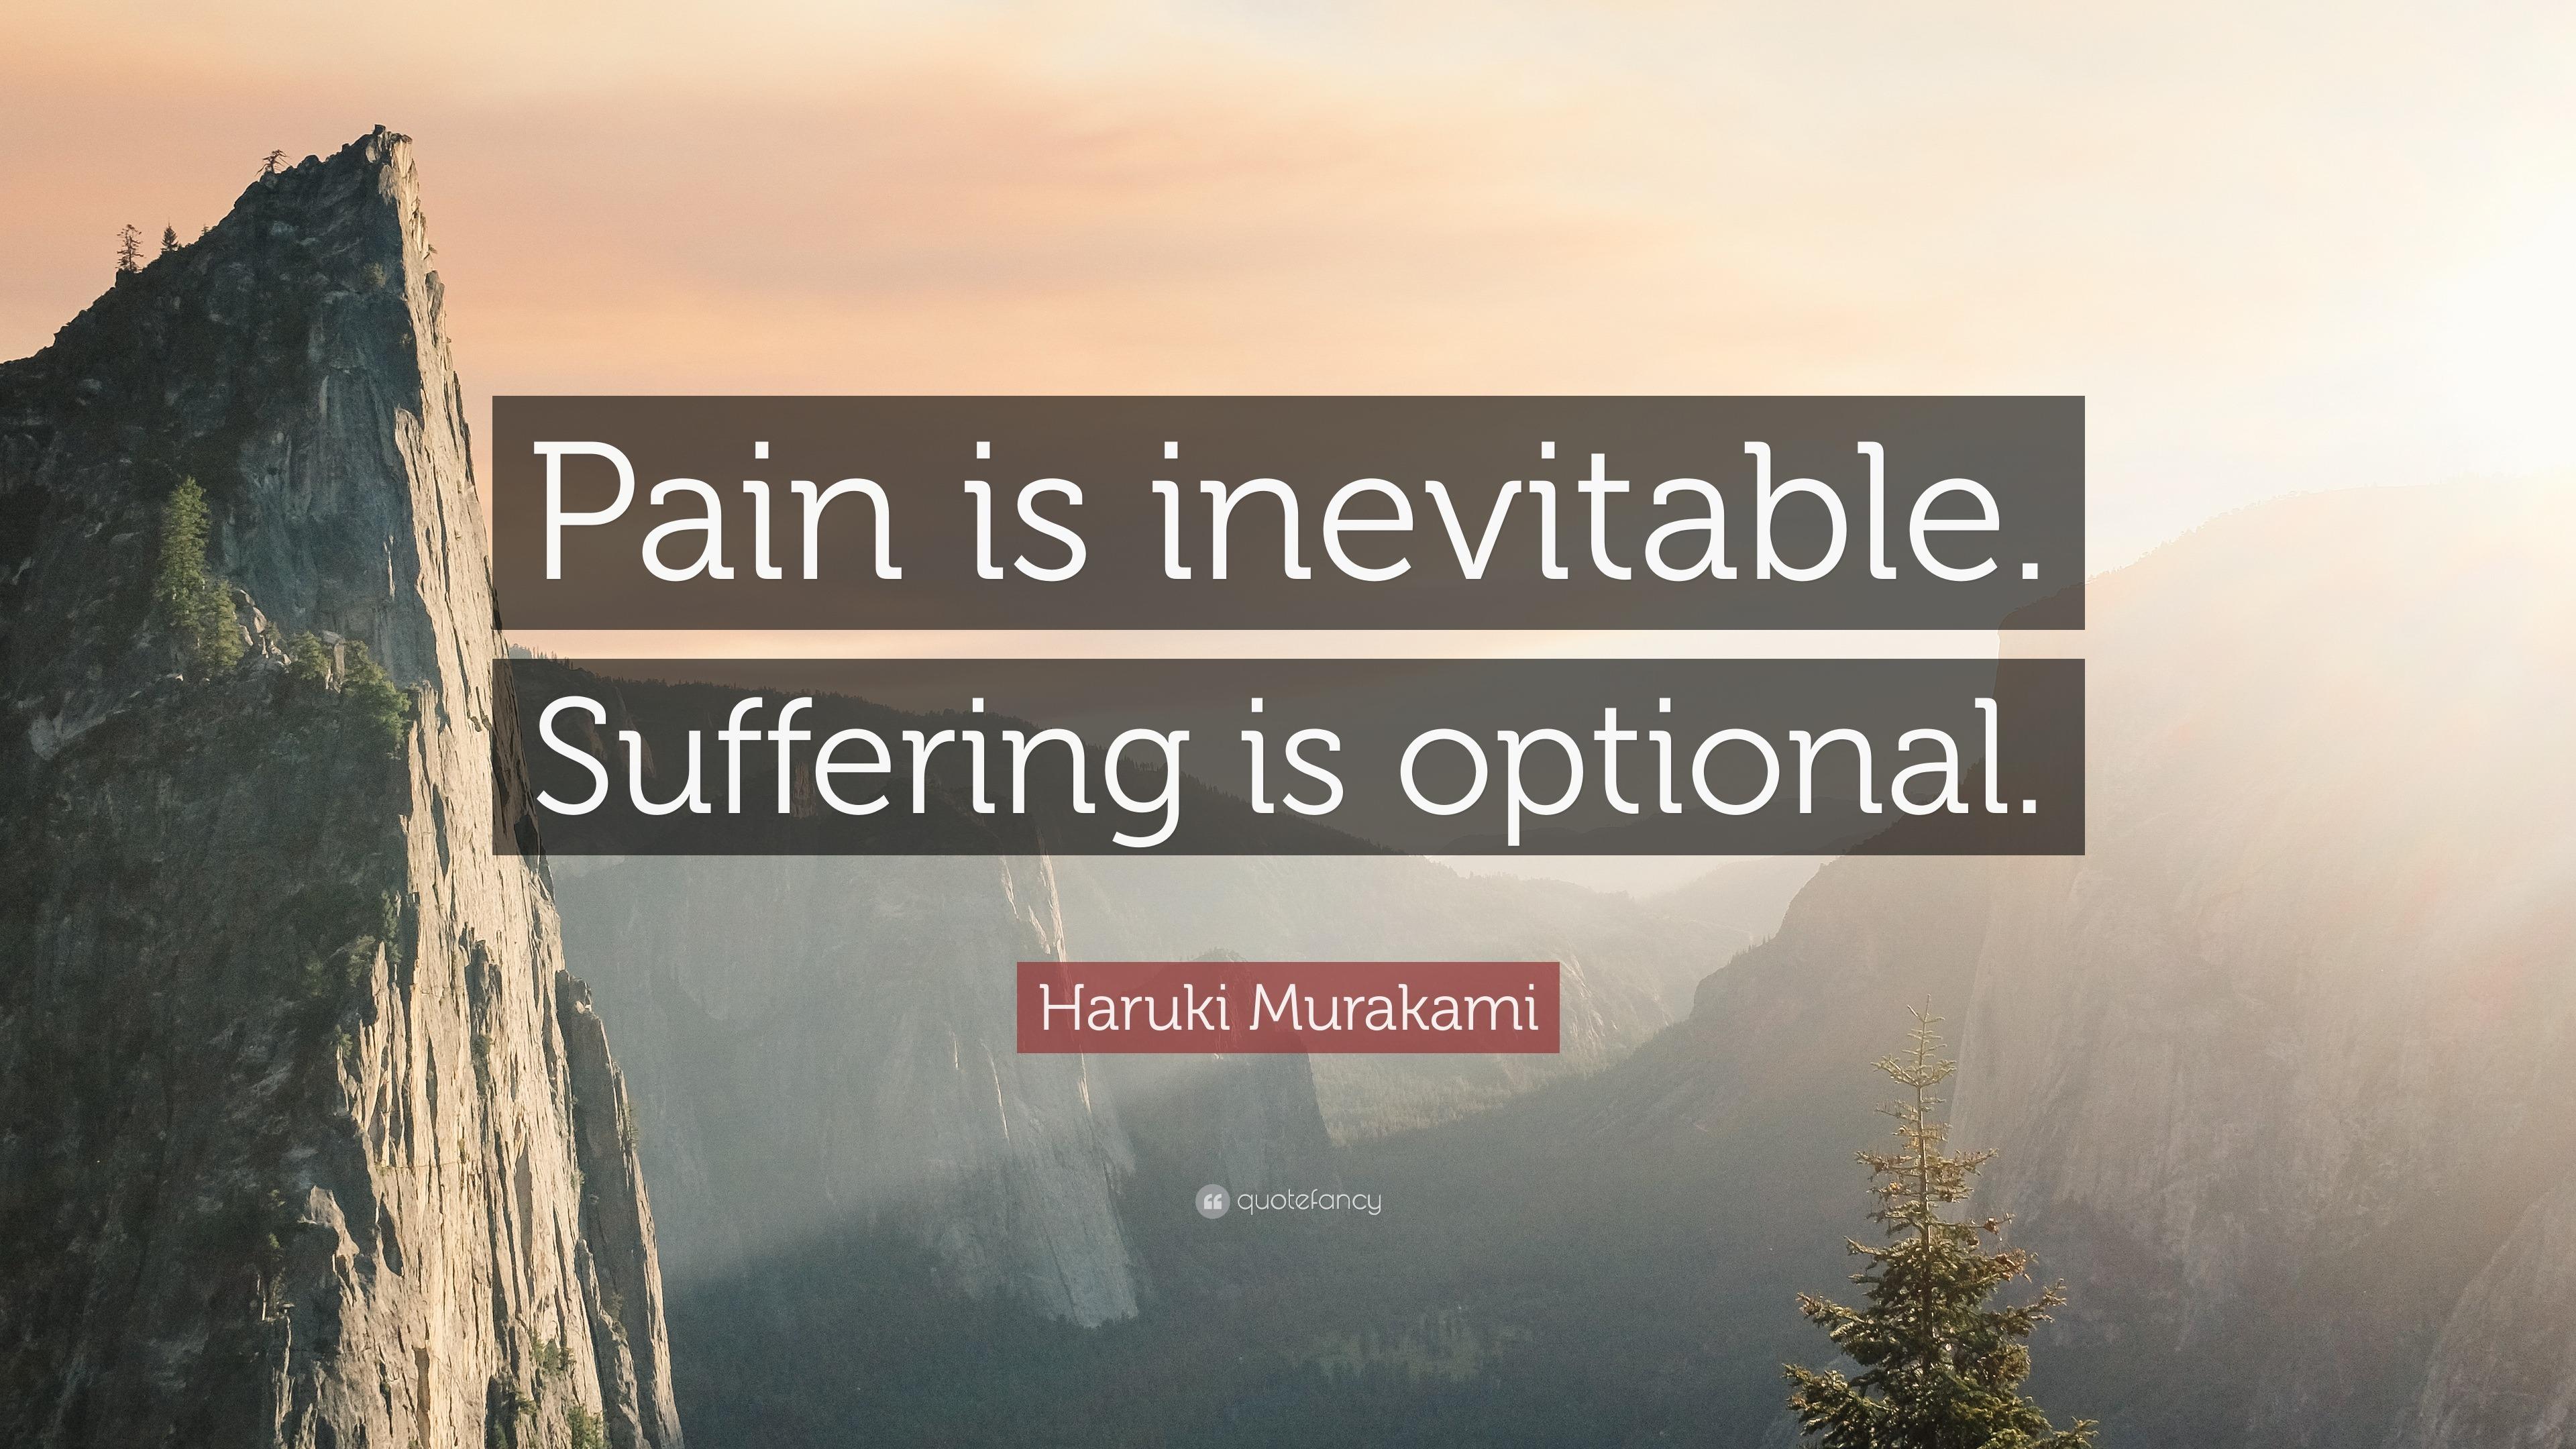 John Lennon Quotes Wallpaper Haruki Murakami Quote Pain Is Inevitable Suffering Is